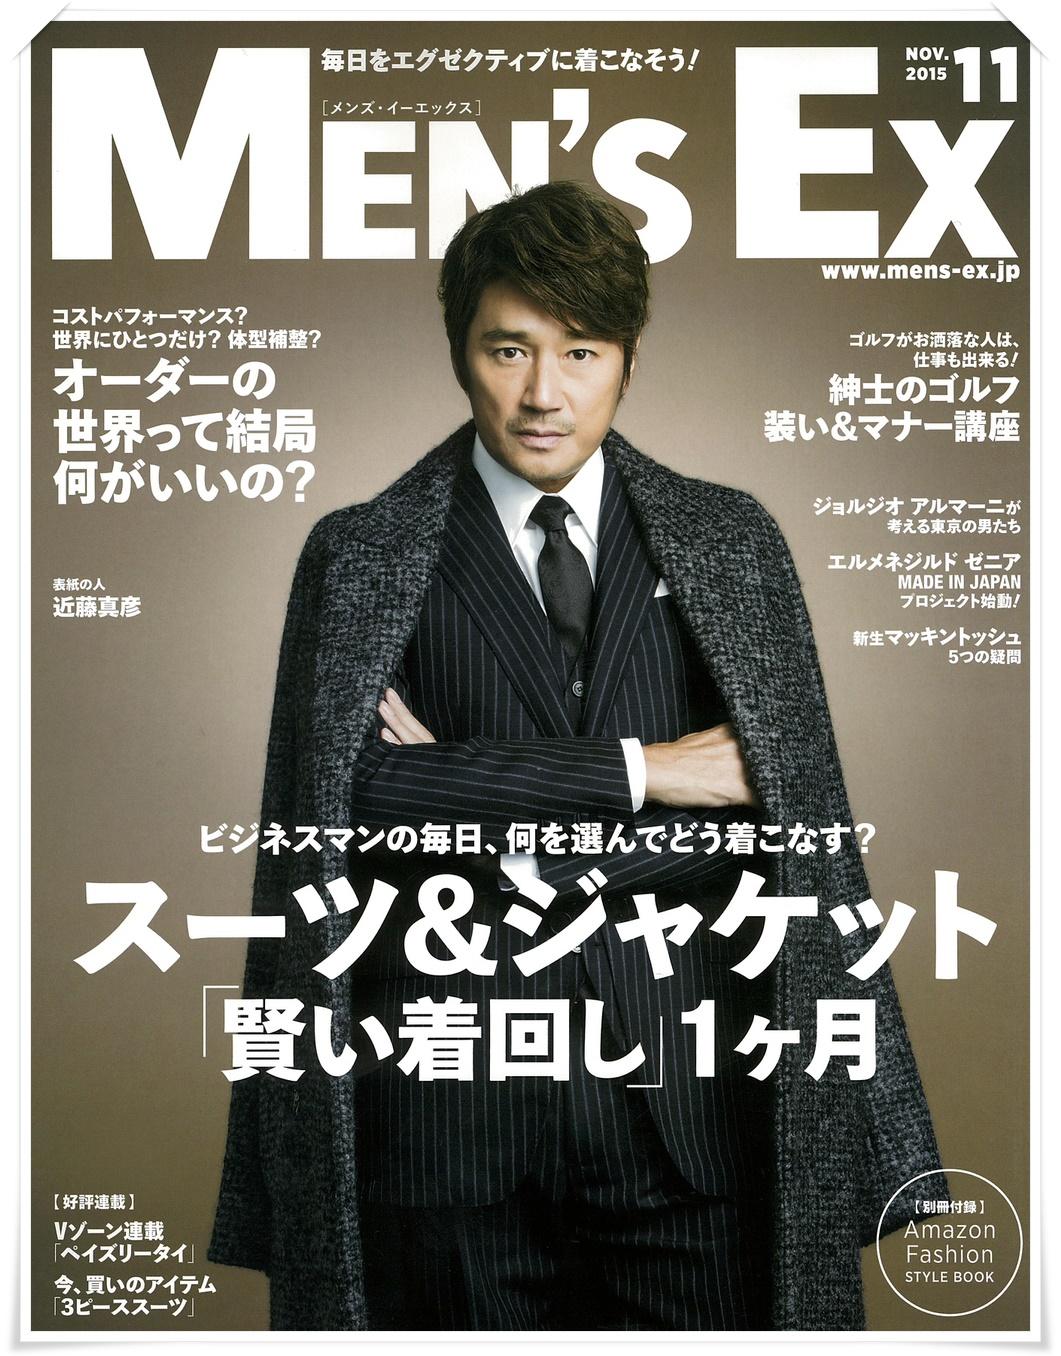 MensEx_2015.11_cover